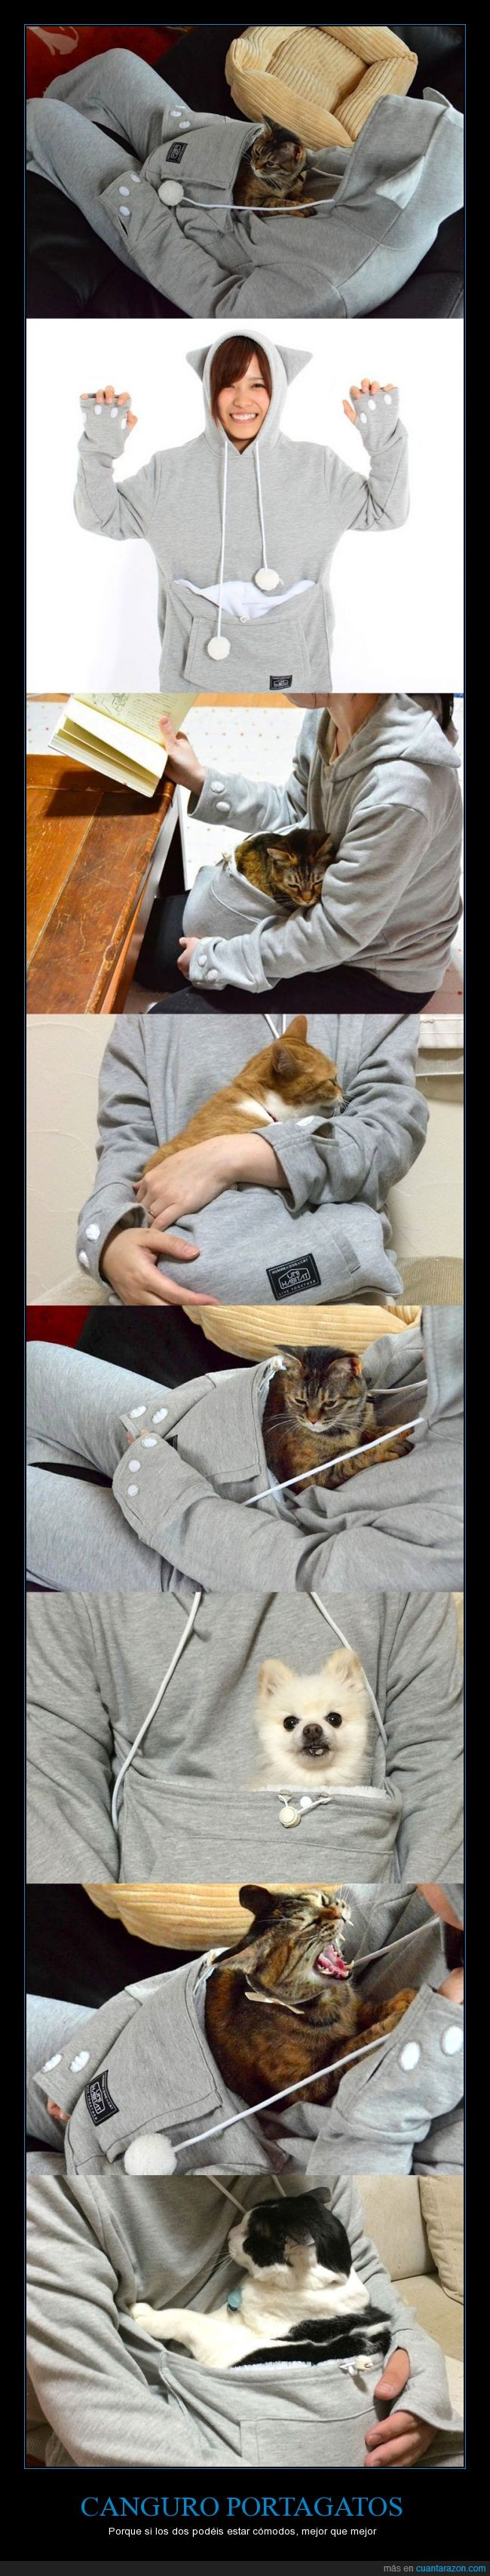 bolsillo,canguro,comodo,dormir,japon,jersey,mascota,perro,portagatos,sudadera